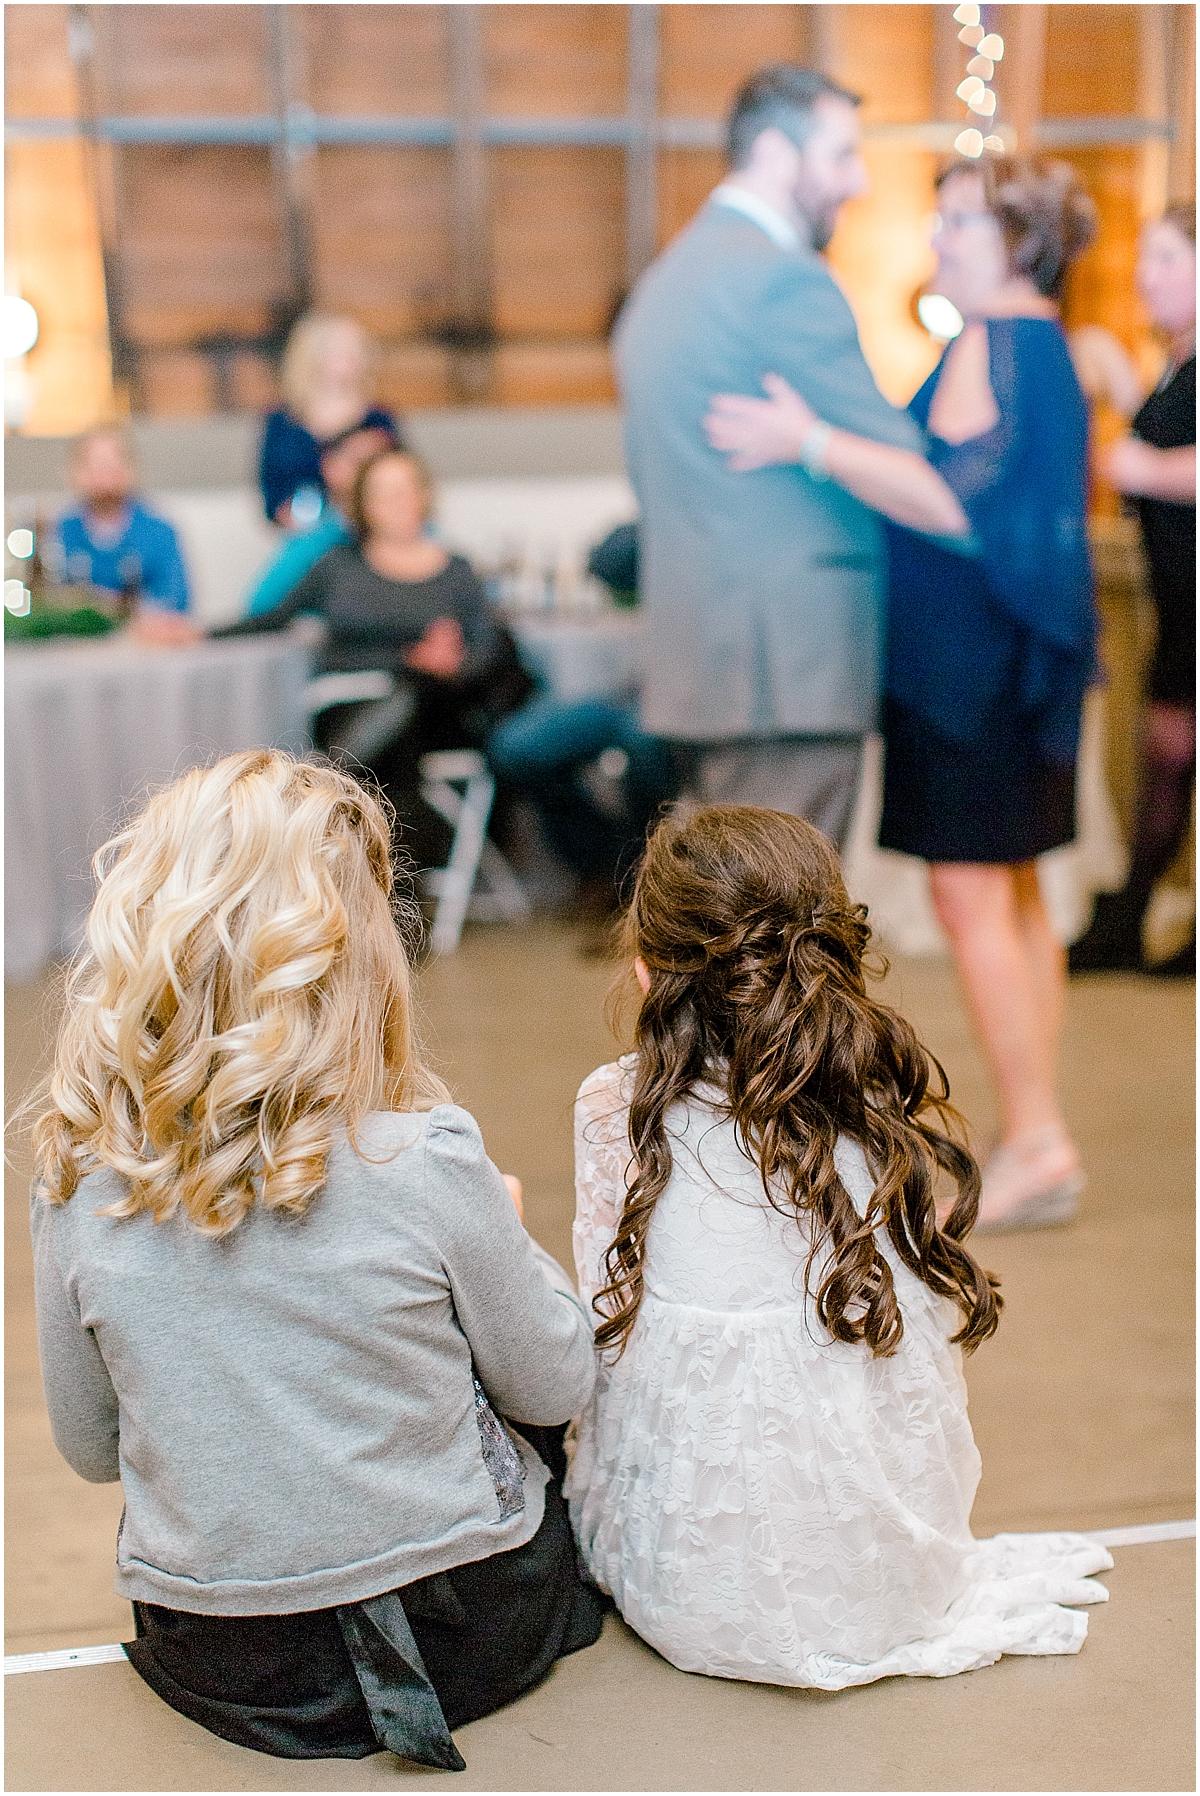 Chehalis Washington Winter Wedding Silver and White | Willapa Hills Farm Wedding | Eastham | Emma Rose Company PNW Light and Airy Wedding Photographer_0068.jpg